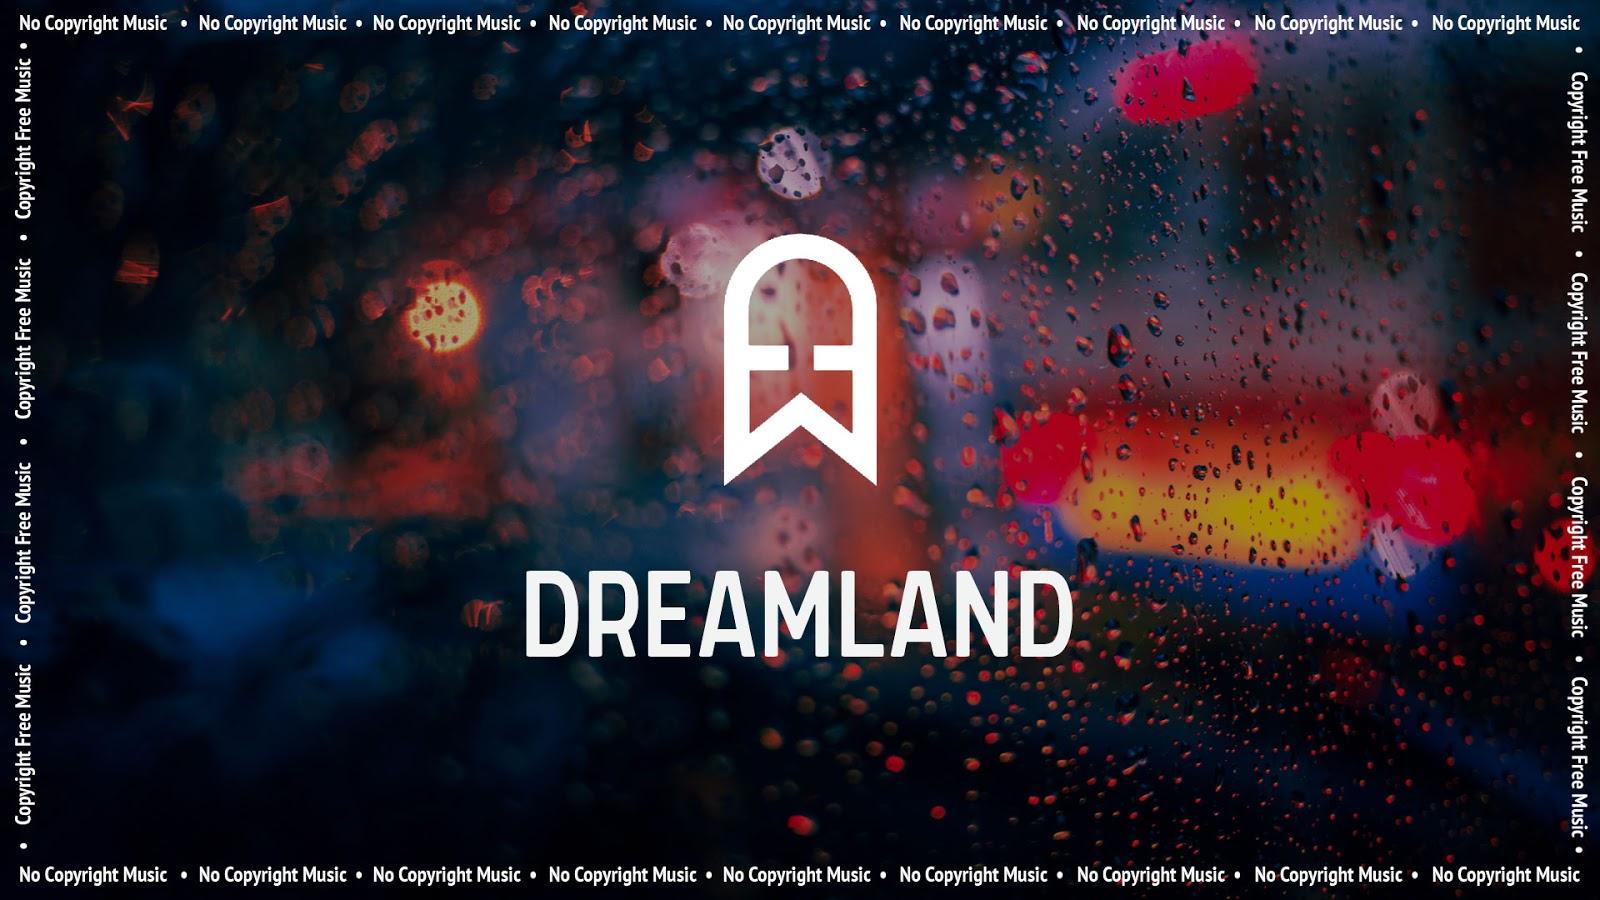 EcroDeron - Dreamland - No Copyright Music - Copyright Free Music - Vlog Music